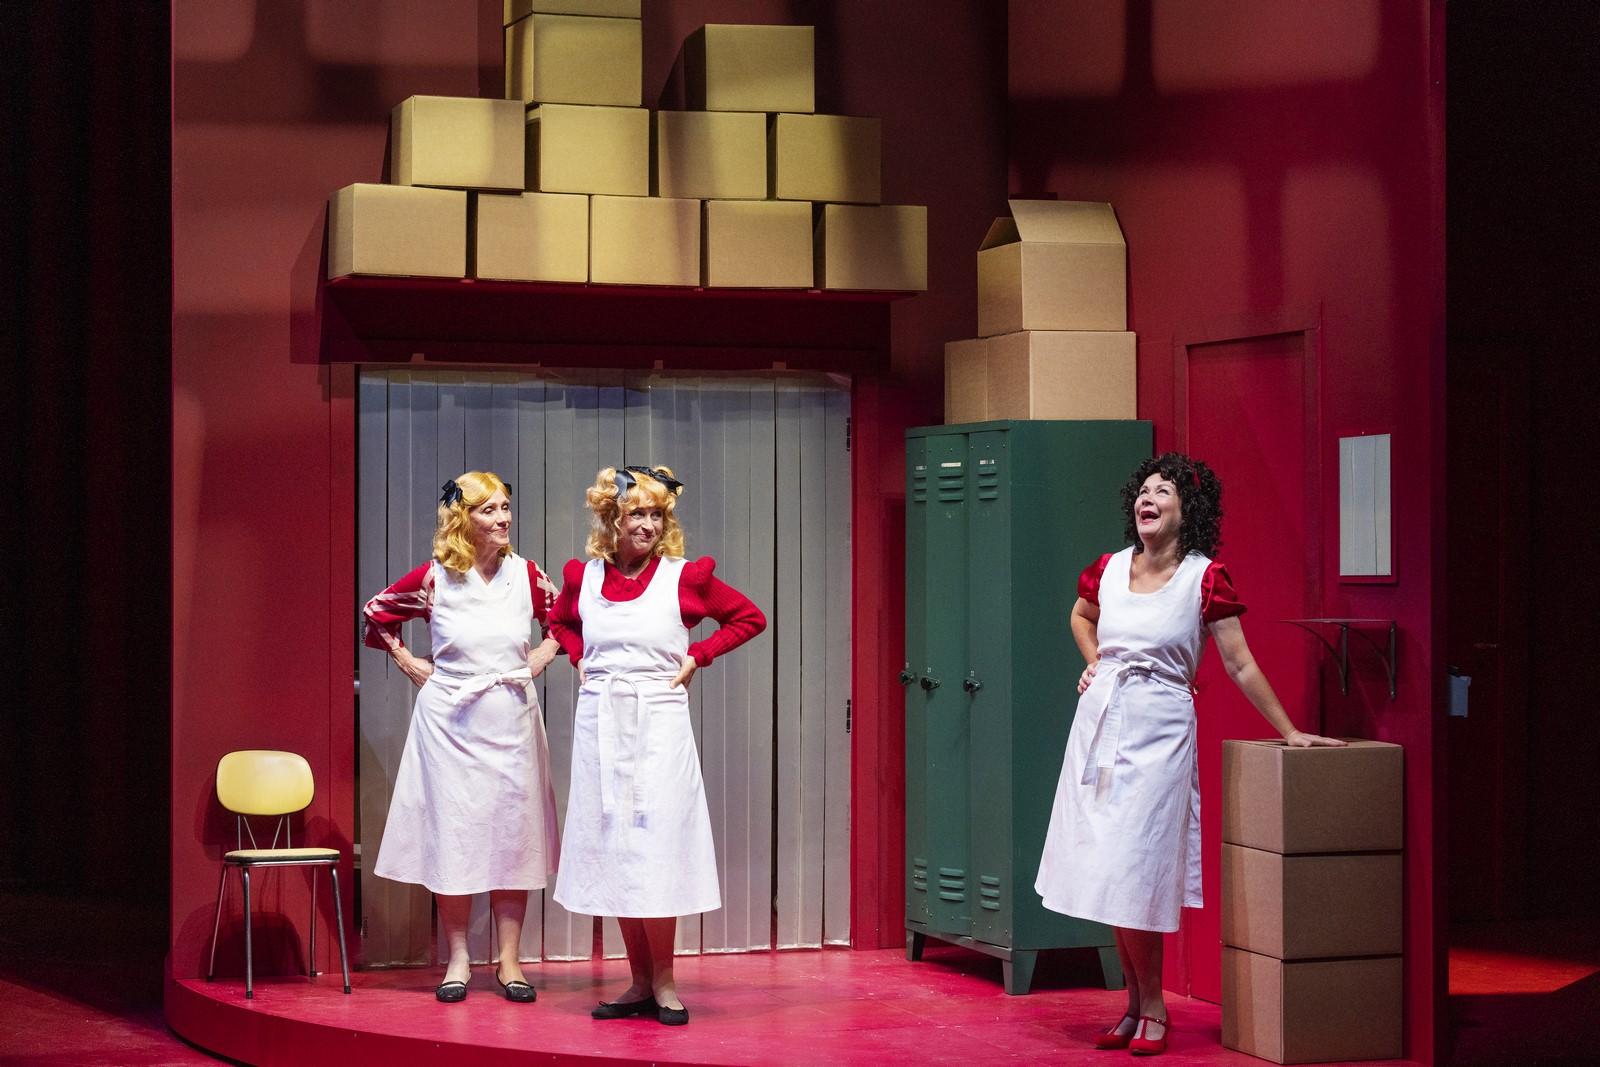 Anmeldelse: Kiksekartellet, Vendsyssel Teater